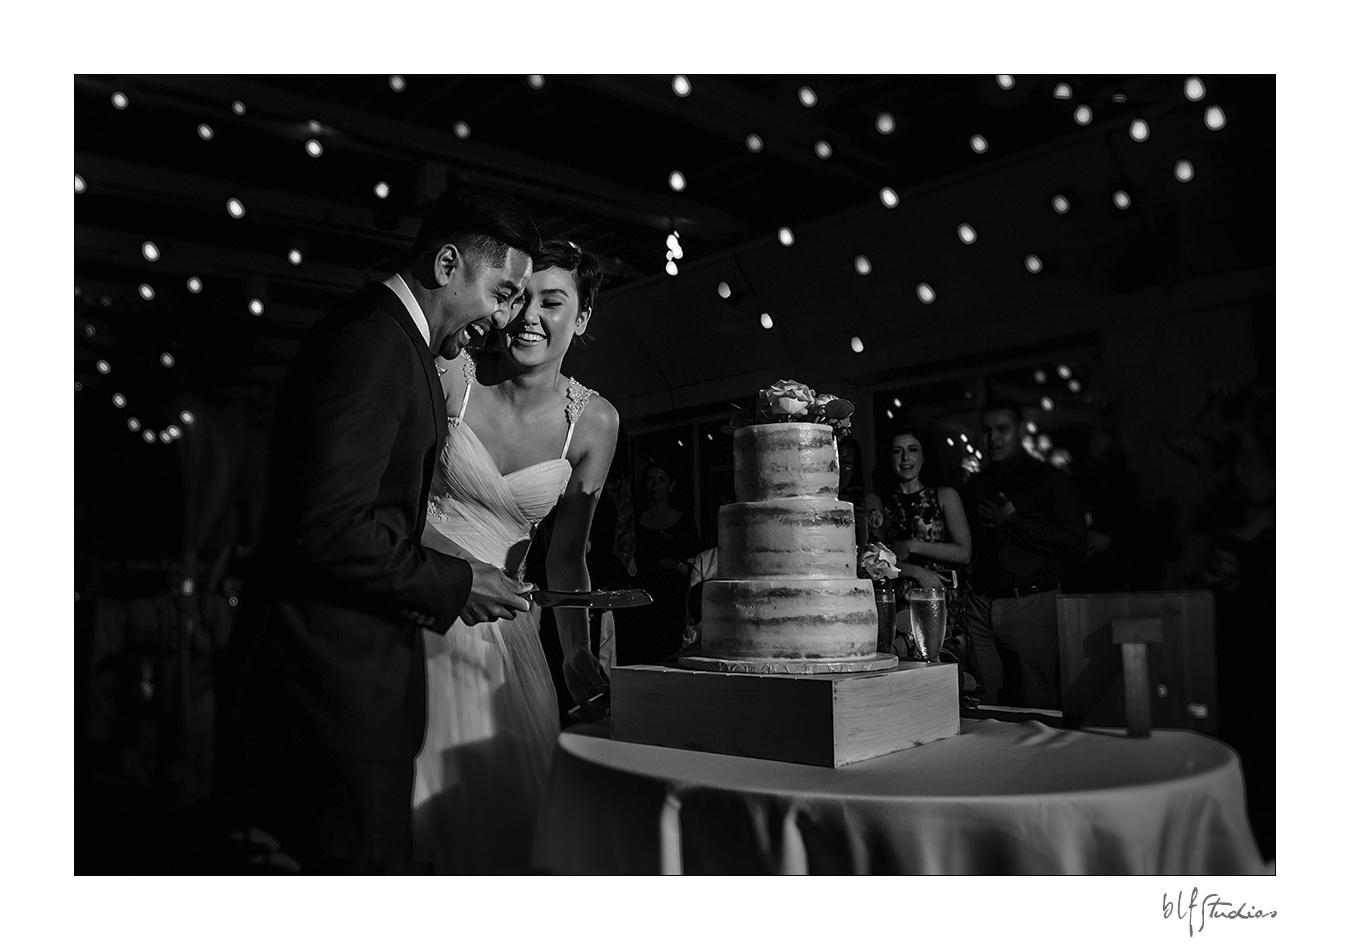 0036-blfstudios-wedding-photographer-daniel-danielle-atlanta.jpg